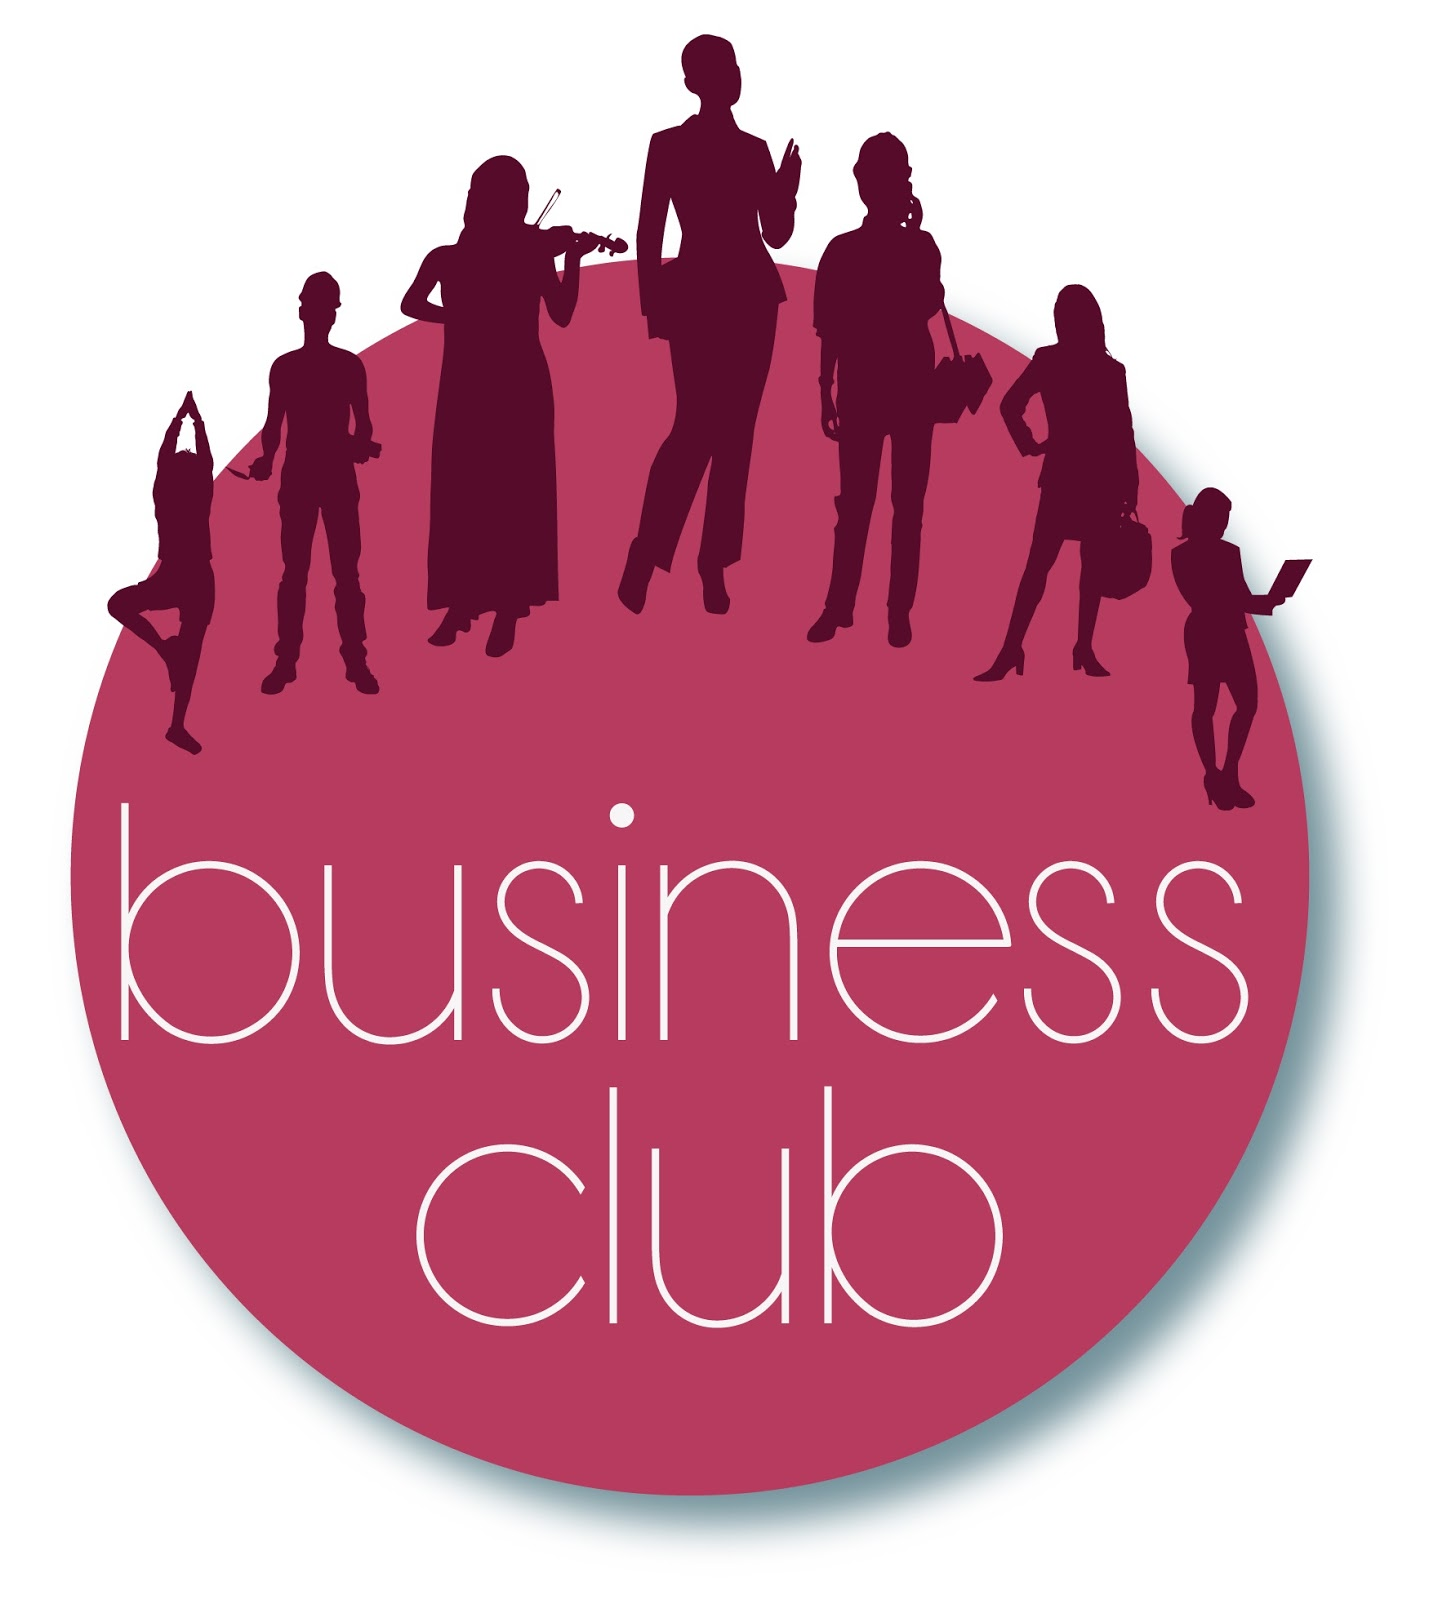 Business%2BClub%2BLogo.jpg